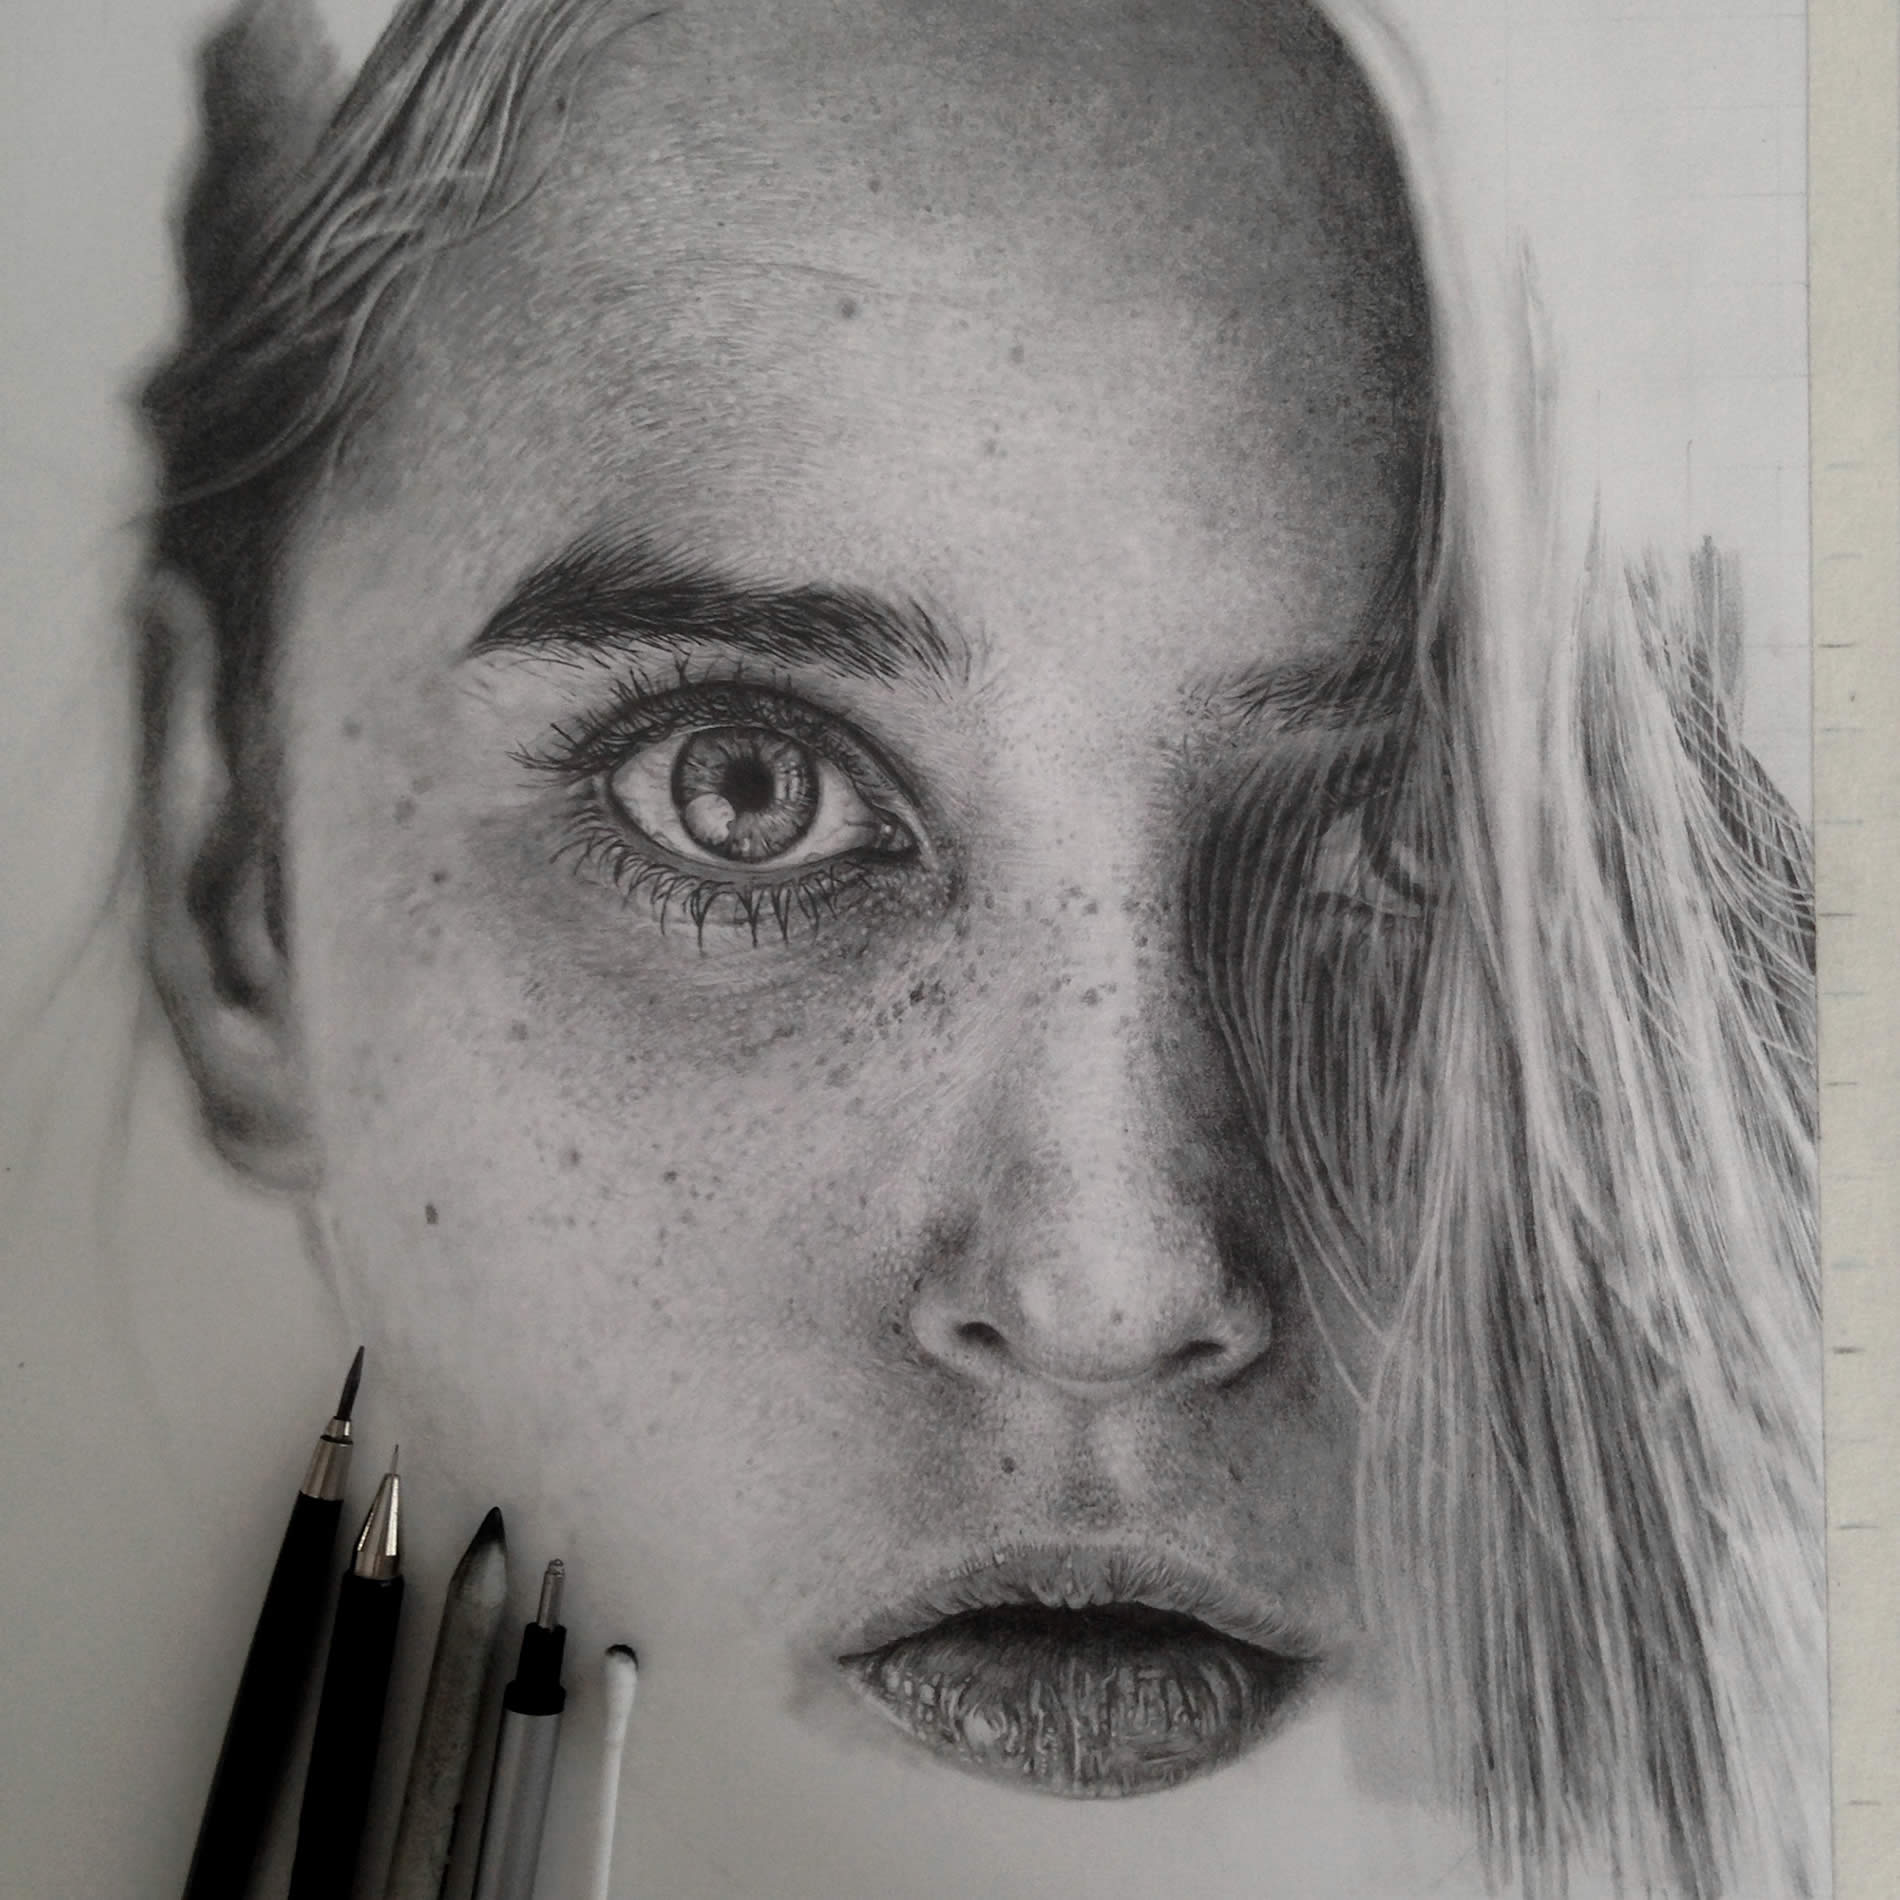 Monica Lee: Hyper-realistic Pencil - 262.0KB